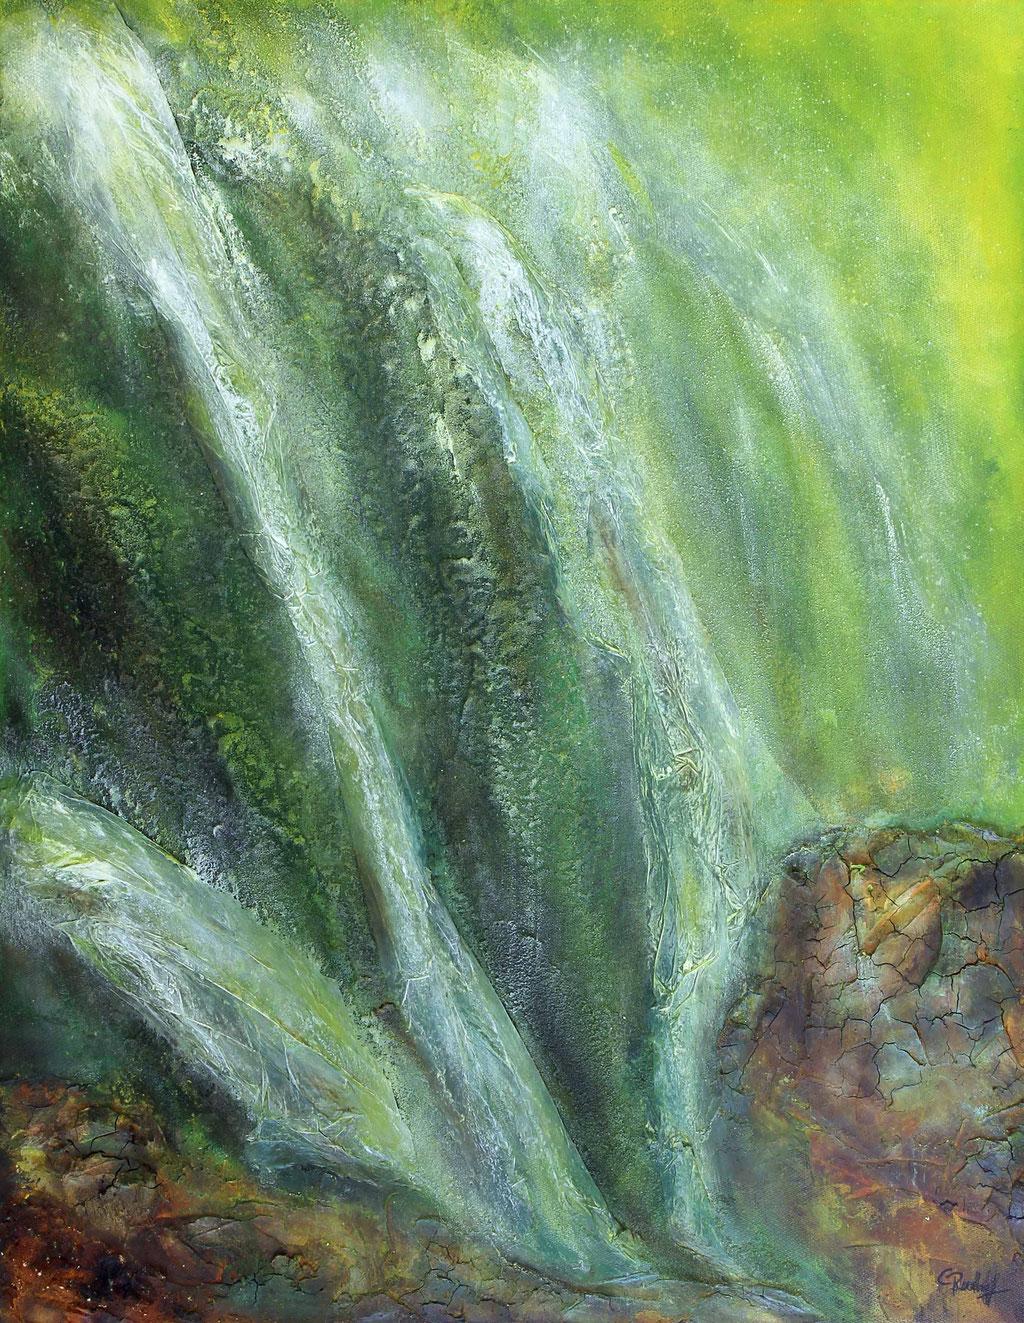 Wasserfall | Acrylmischtechnik | 60cm x 50cm